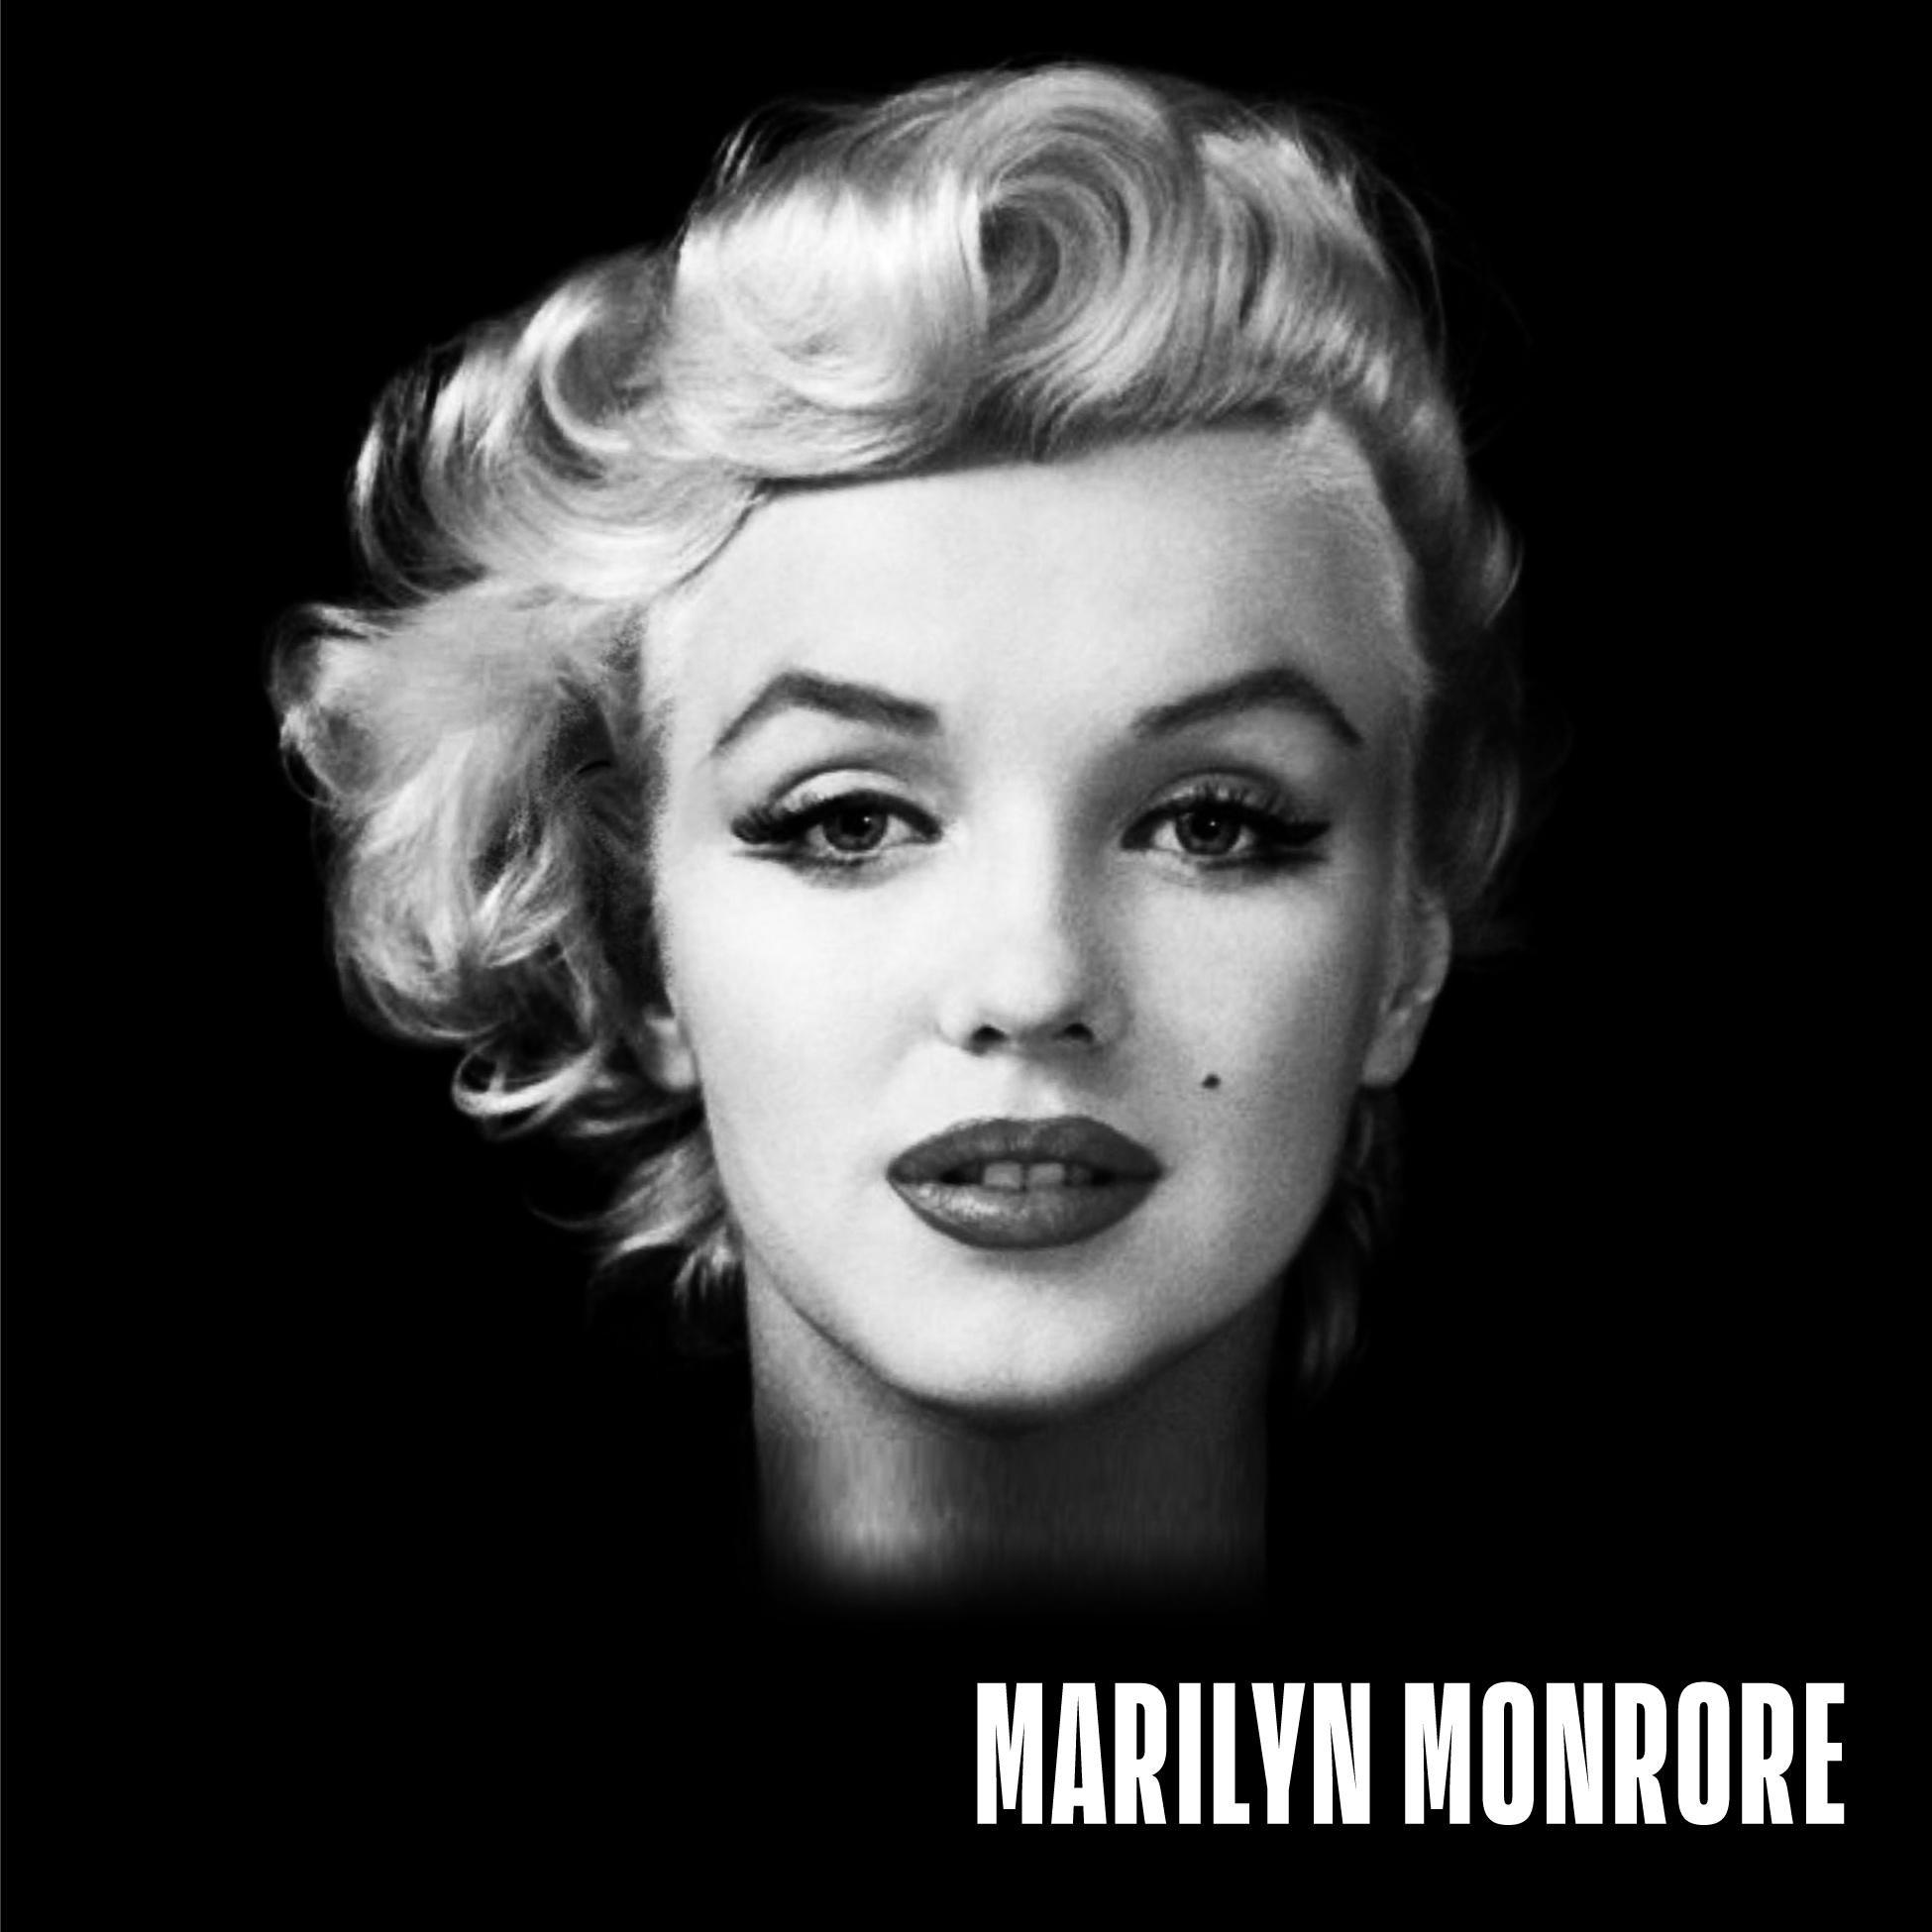 Marilyn Manson Monroe Hybrid Images